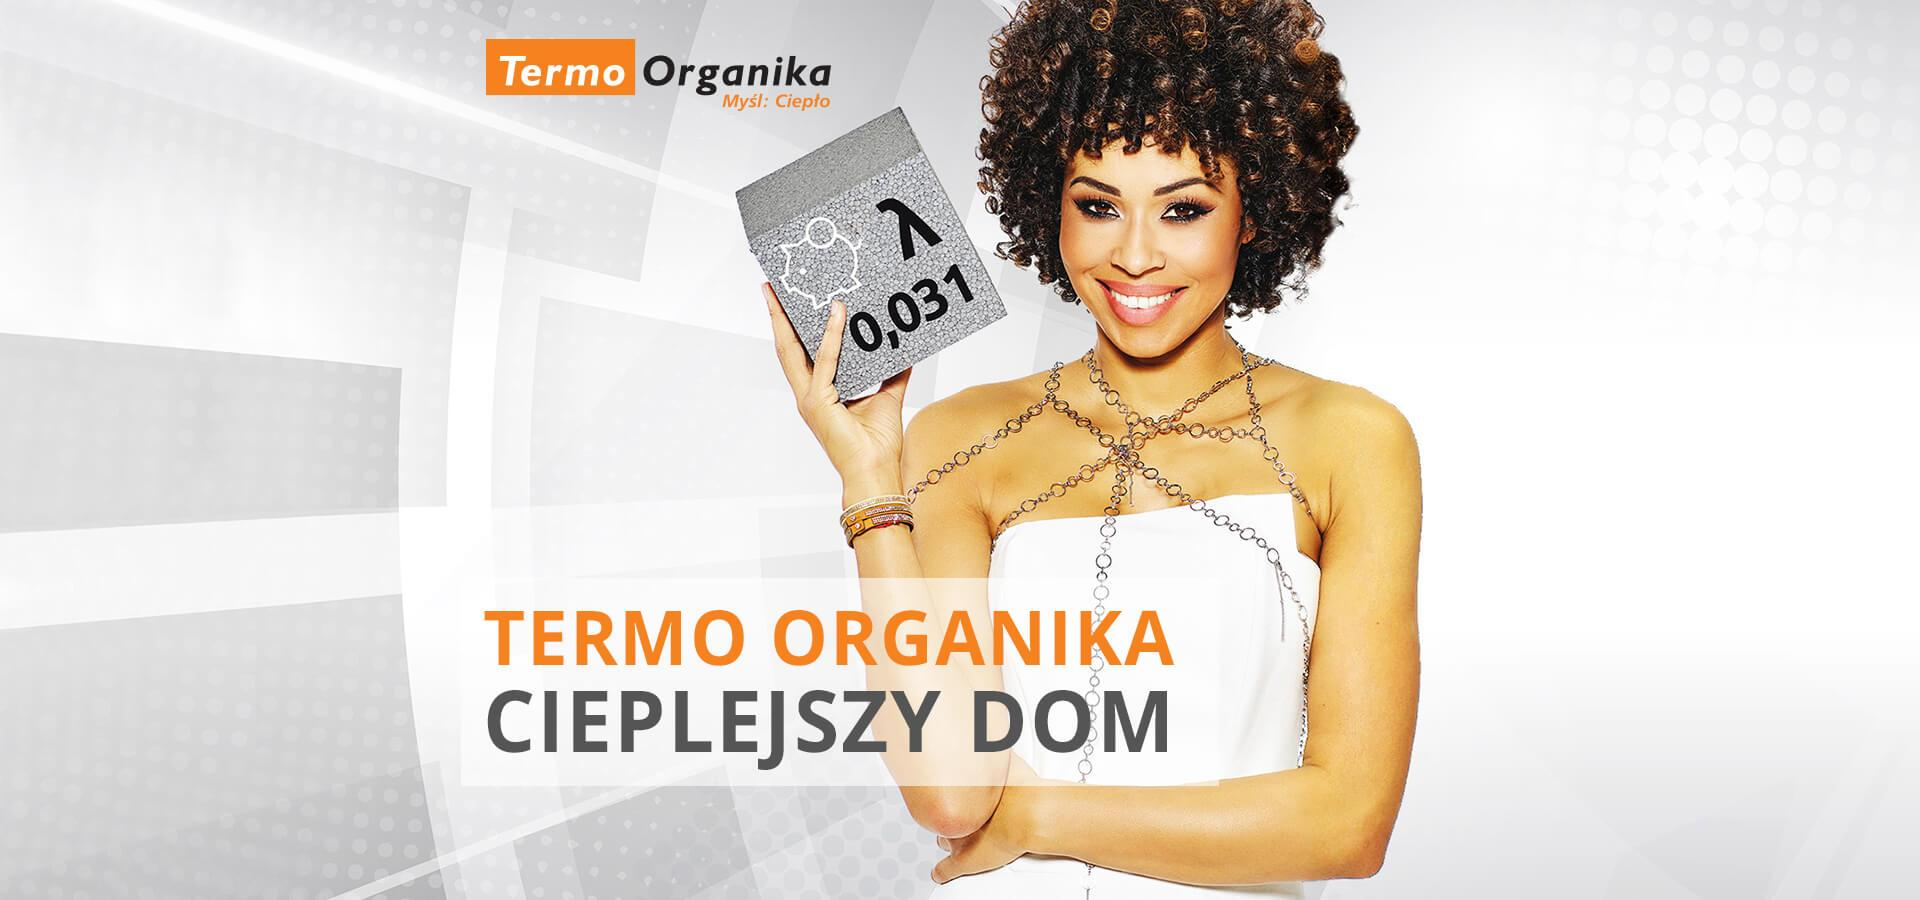 termoorganika_otwarcie